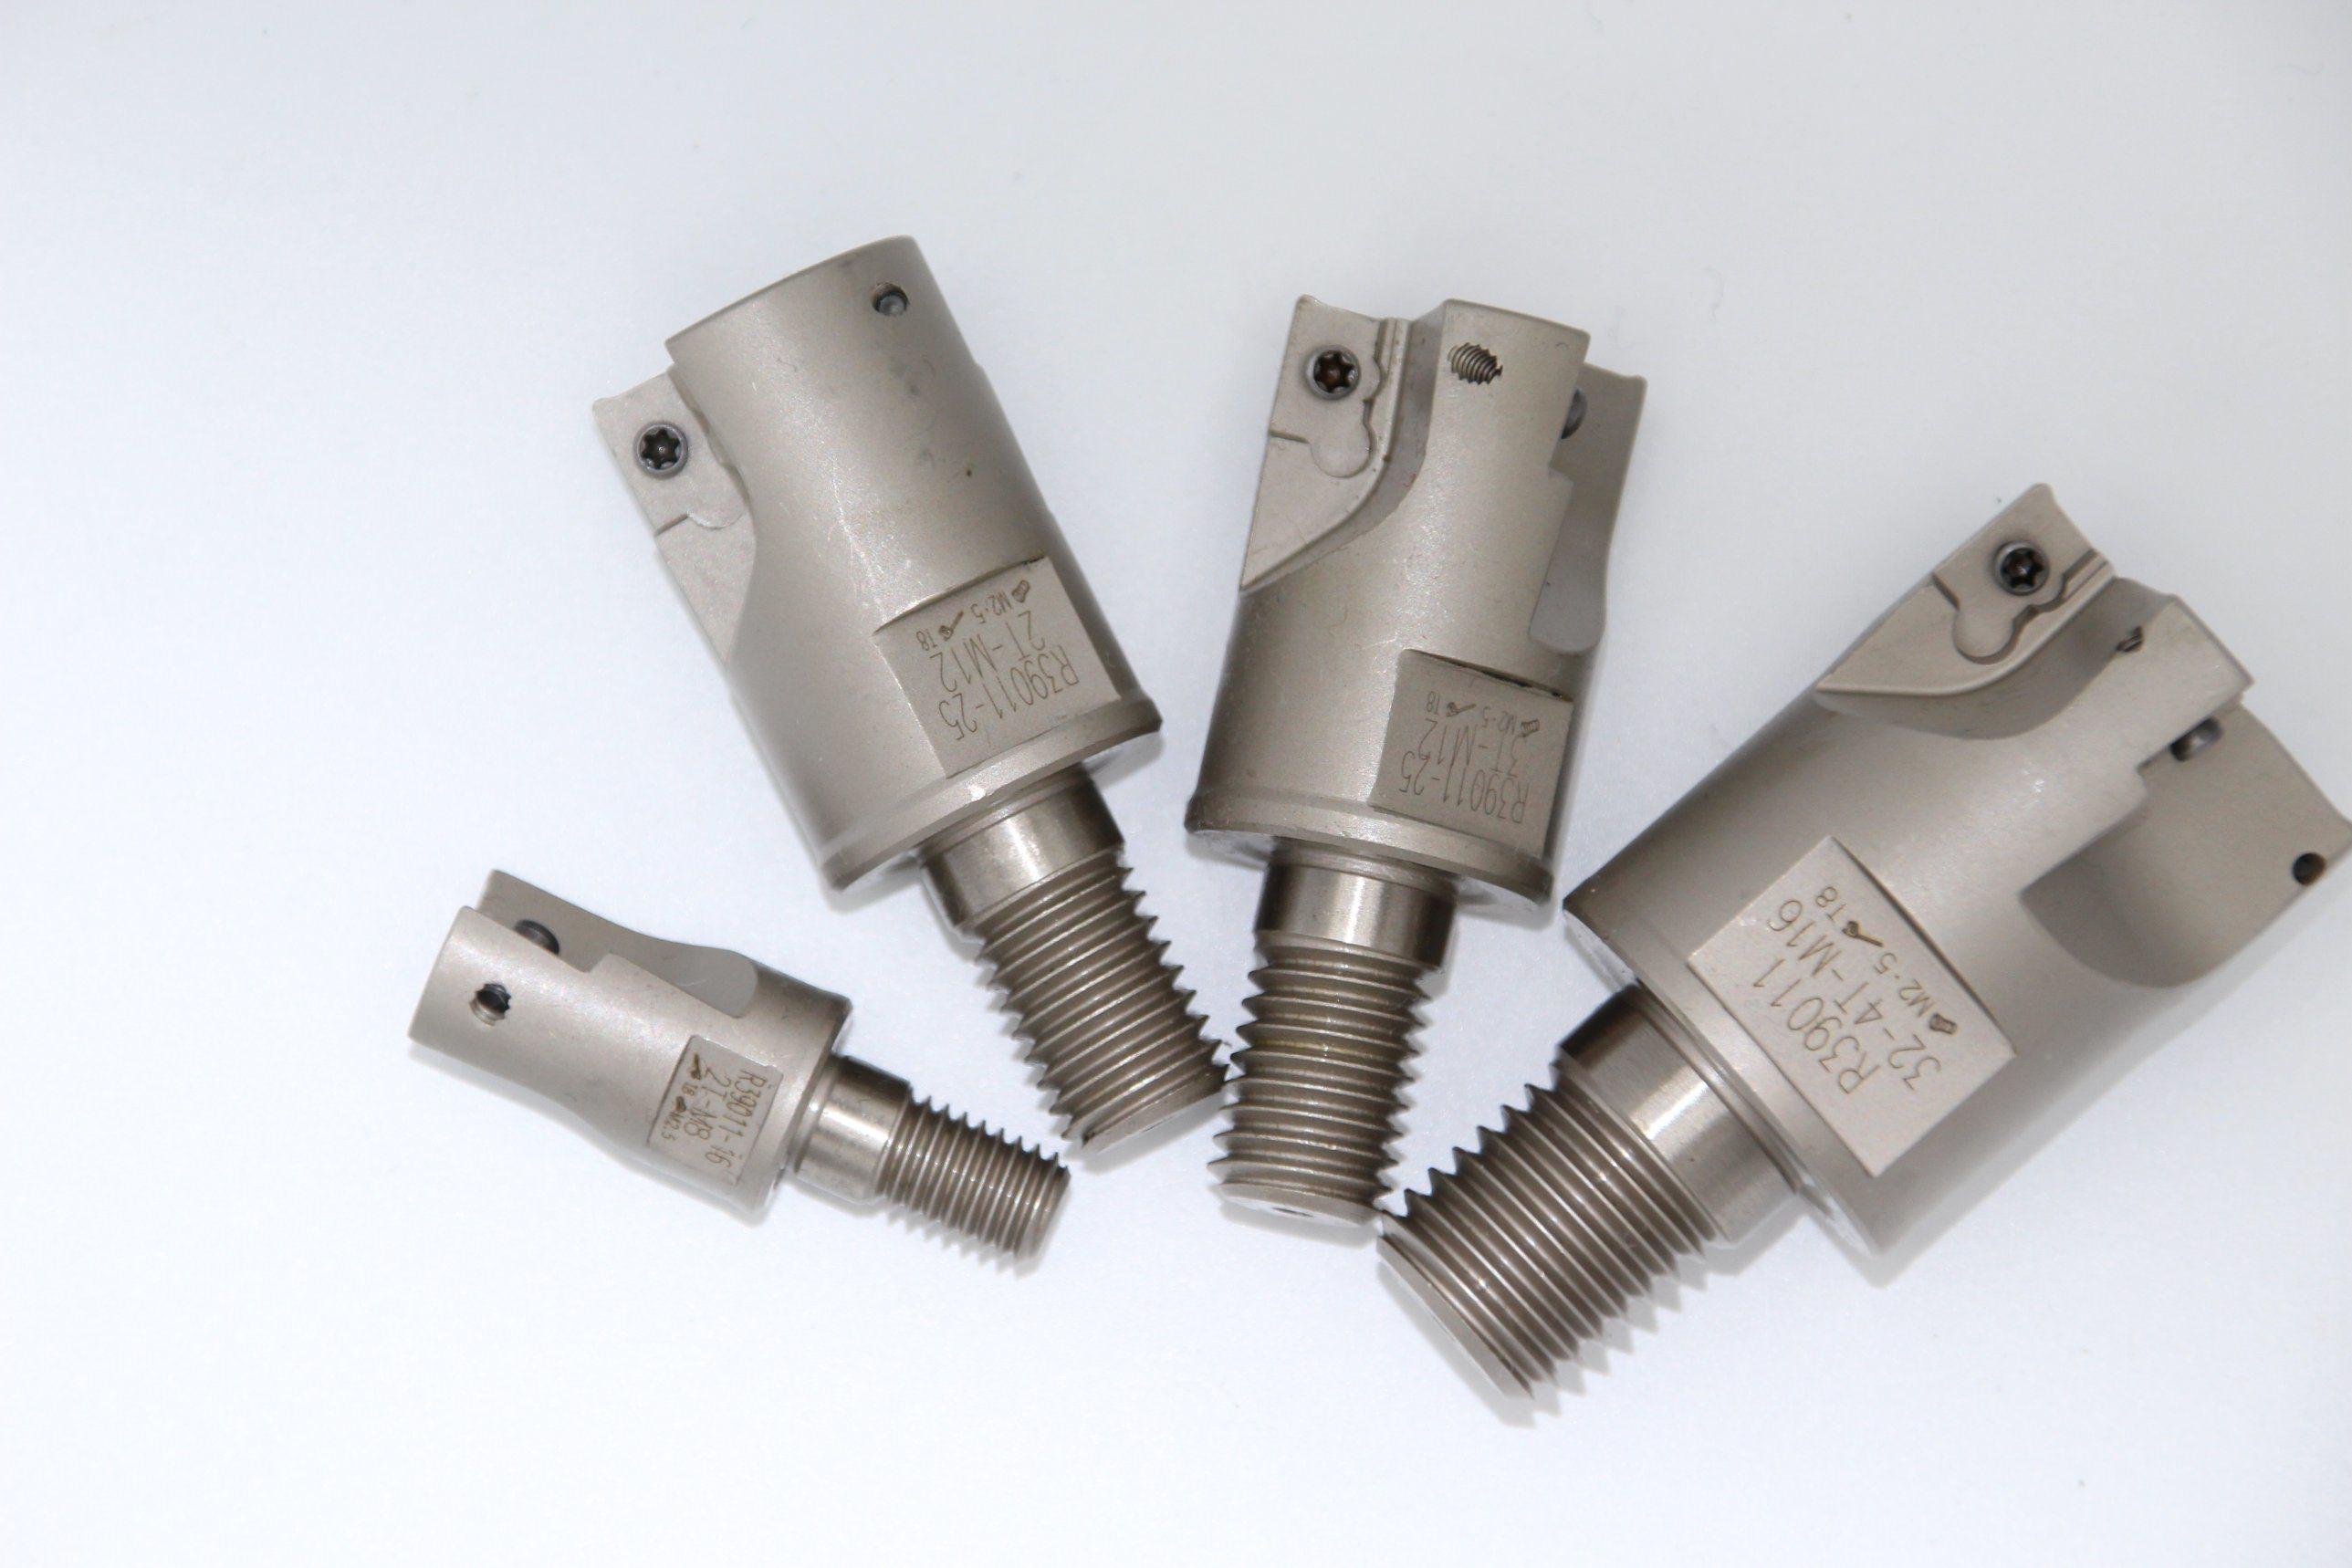 [Hot Item] Krte High Precision Shoulder/Cutting End Mills (R390)